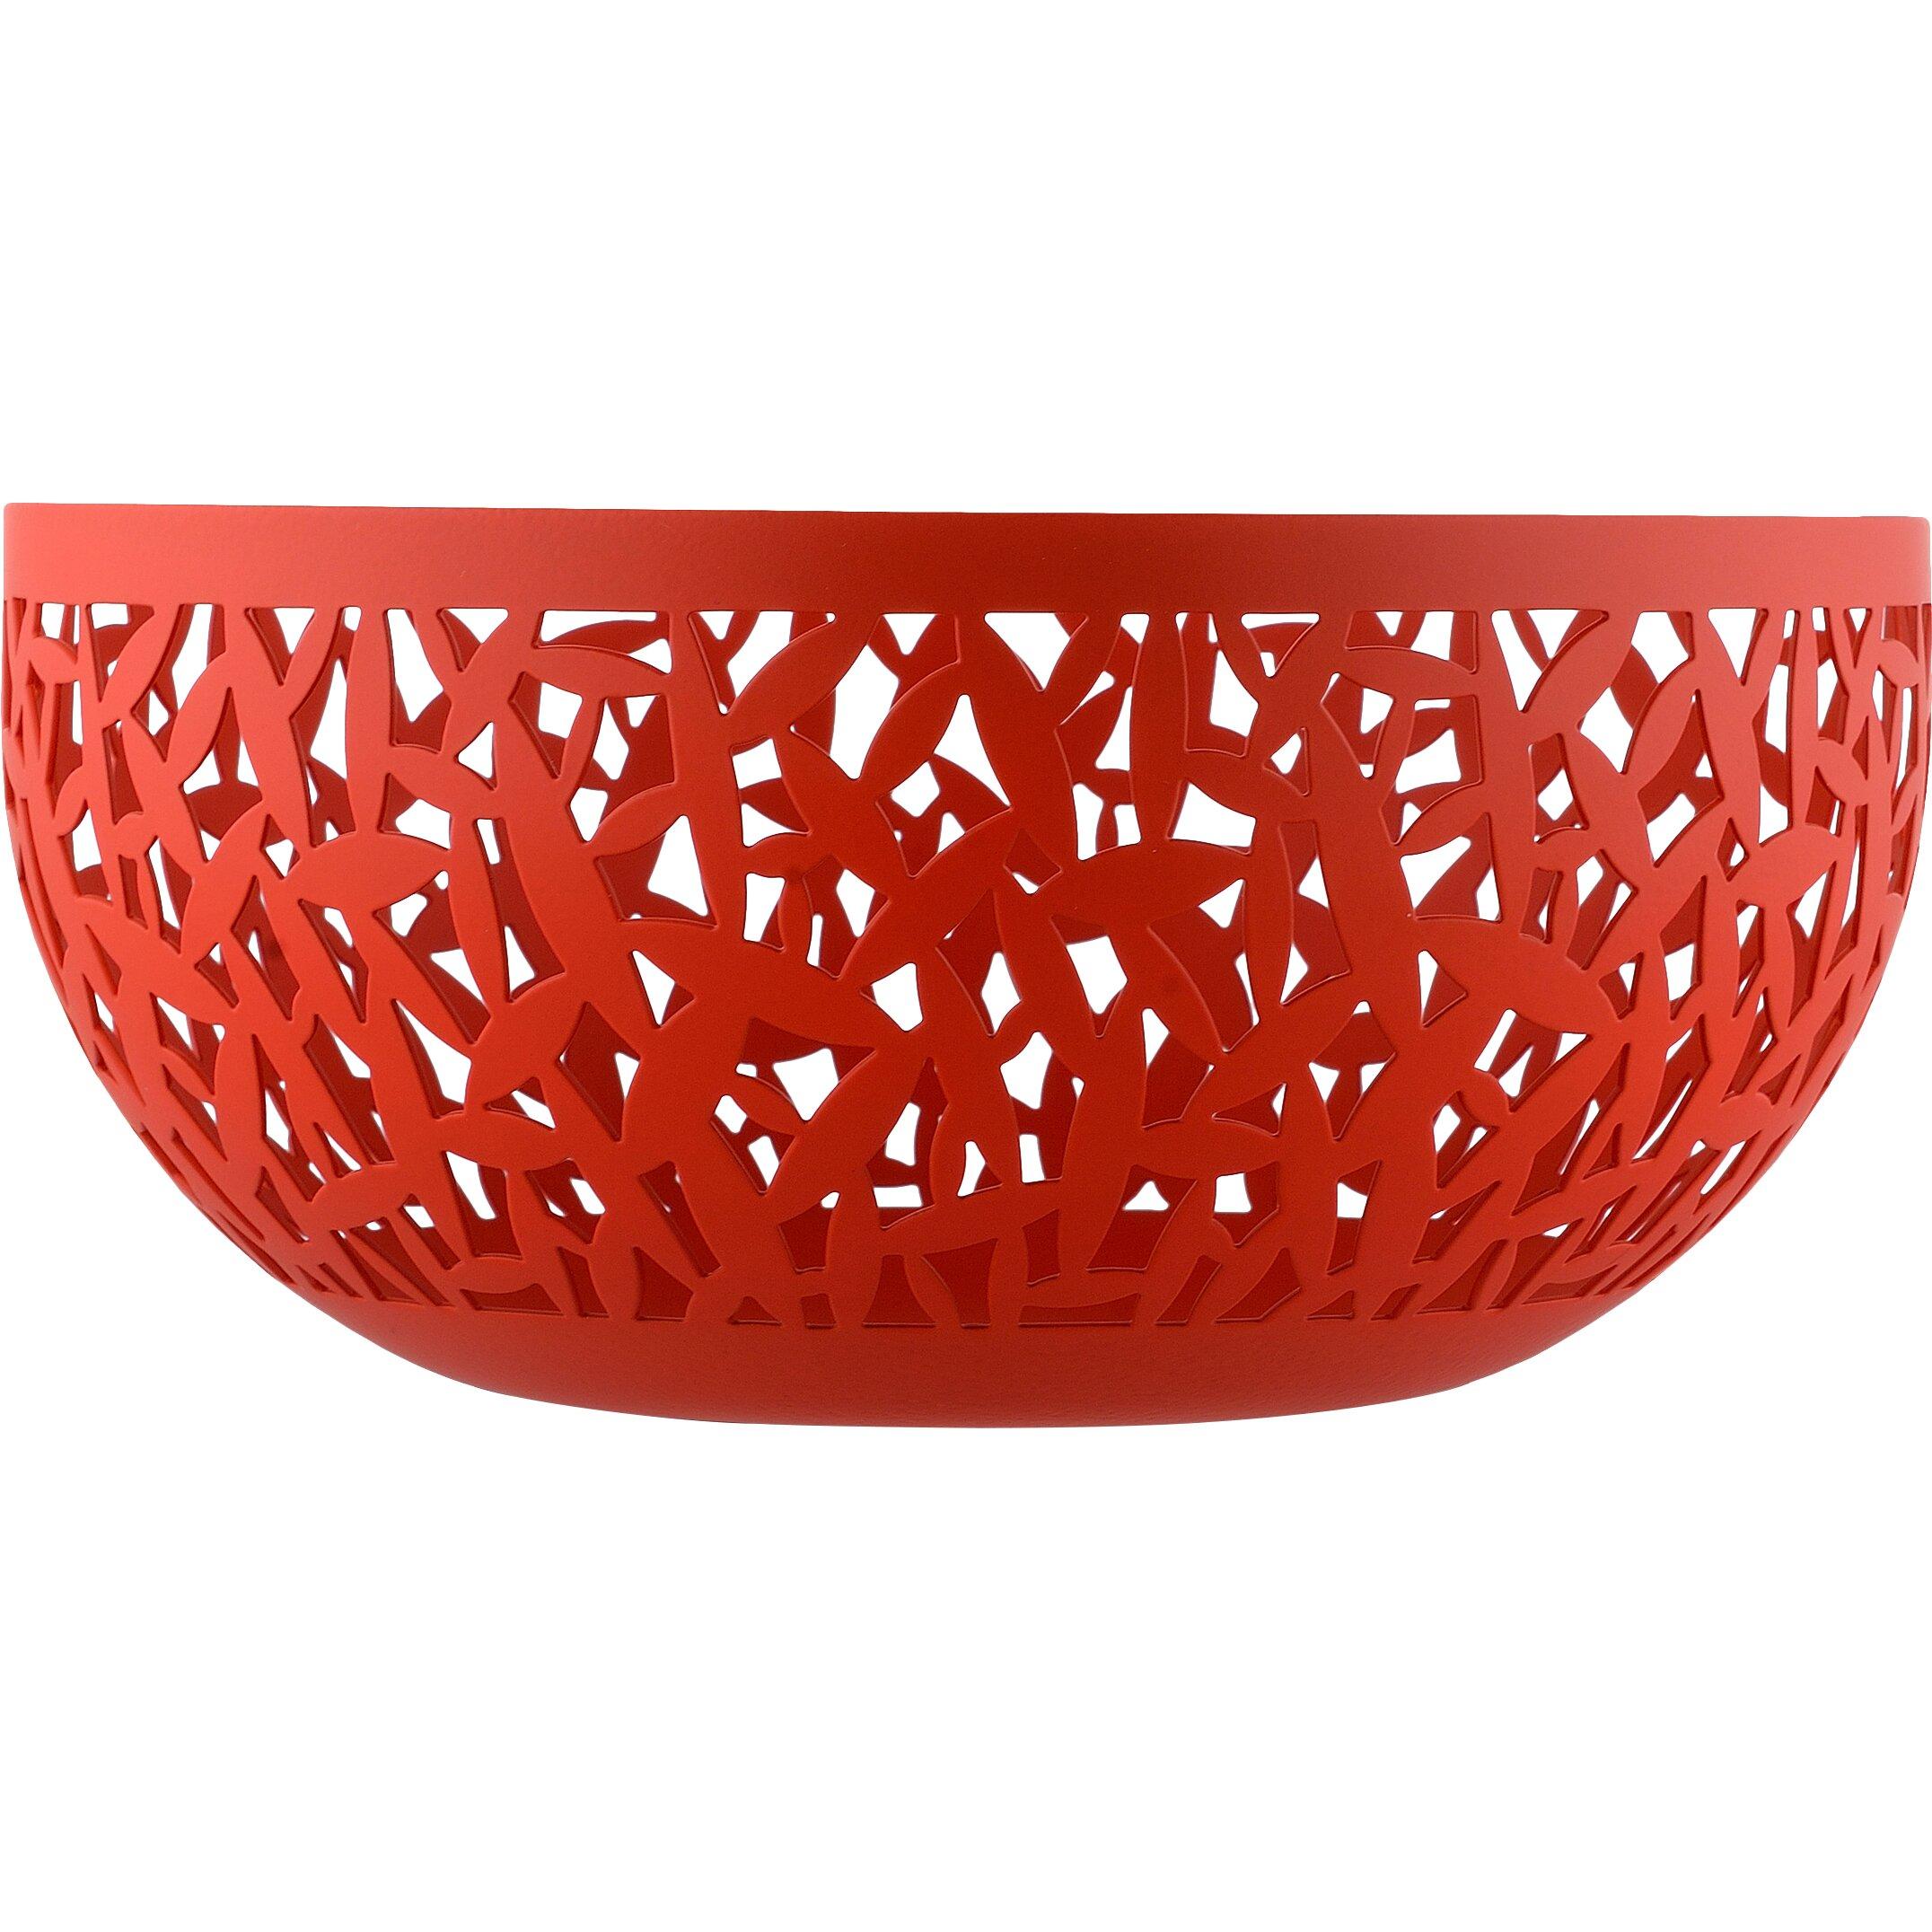 Alessi cactus fruit bowl reviews wayfair uk - Alessi fruit bowl ...